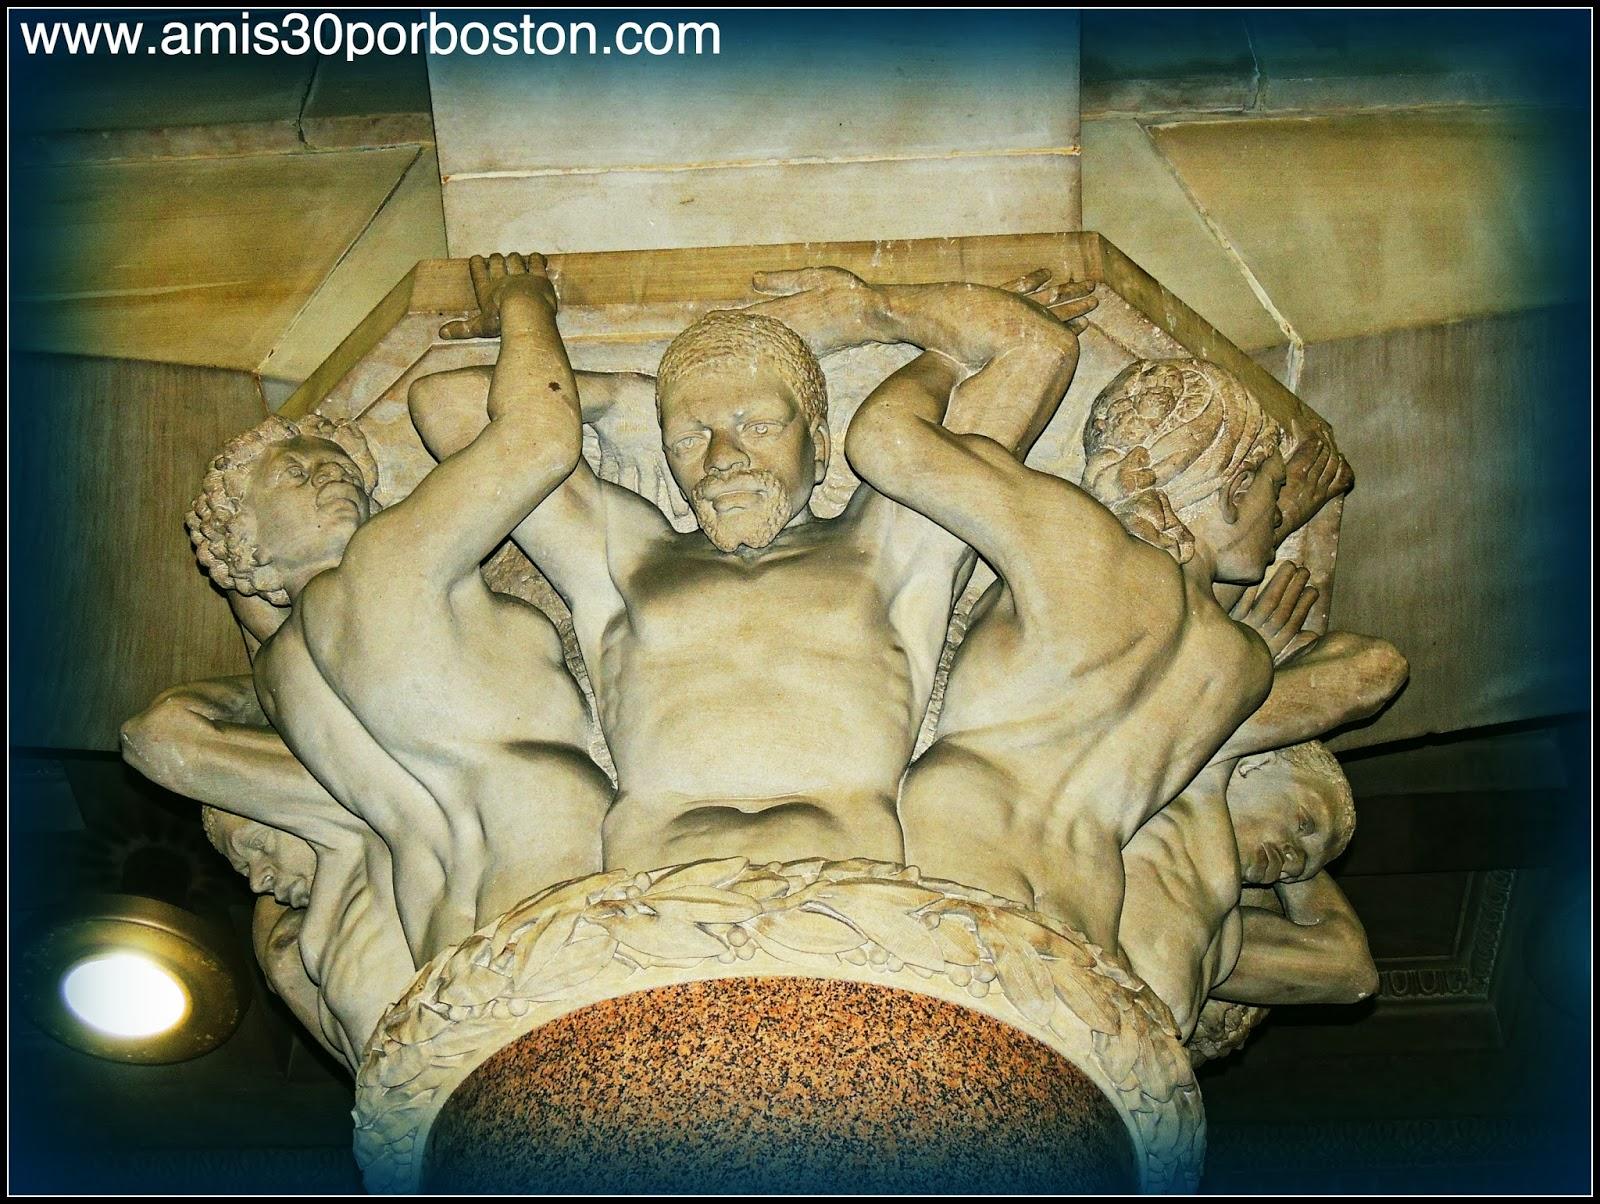 Filadelfia: City Hall